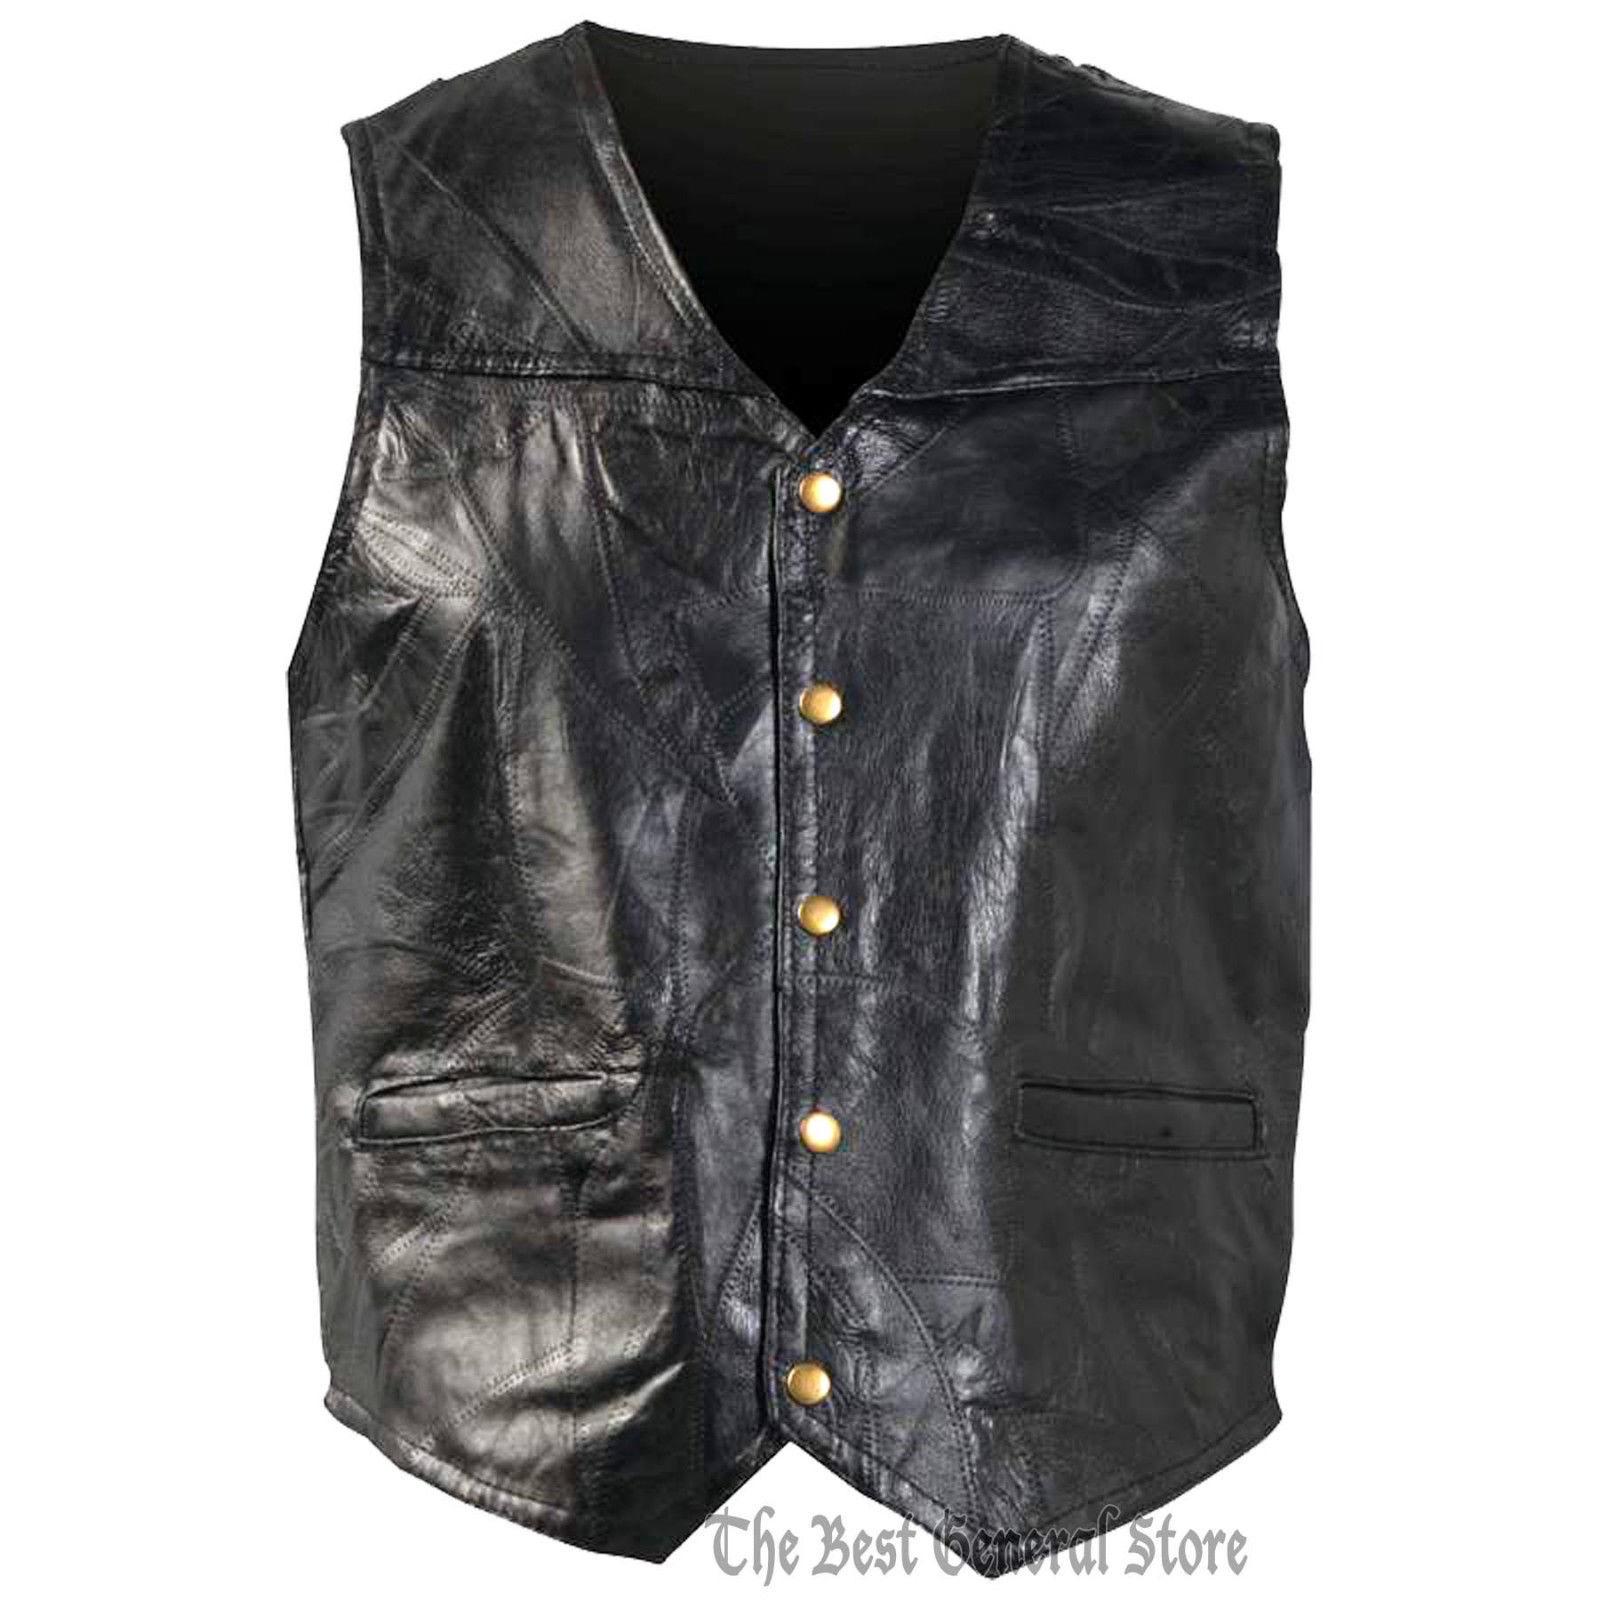 Mens LARGE Genunie Leather Motorcycle Biker Vest Italian Design Leather Jacket L